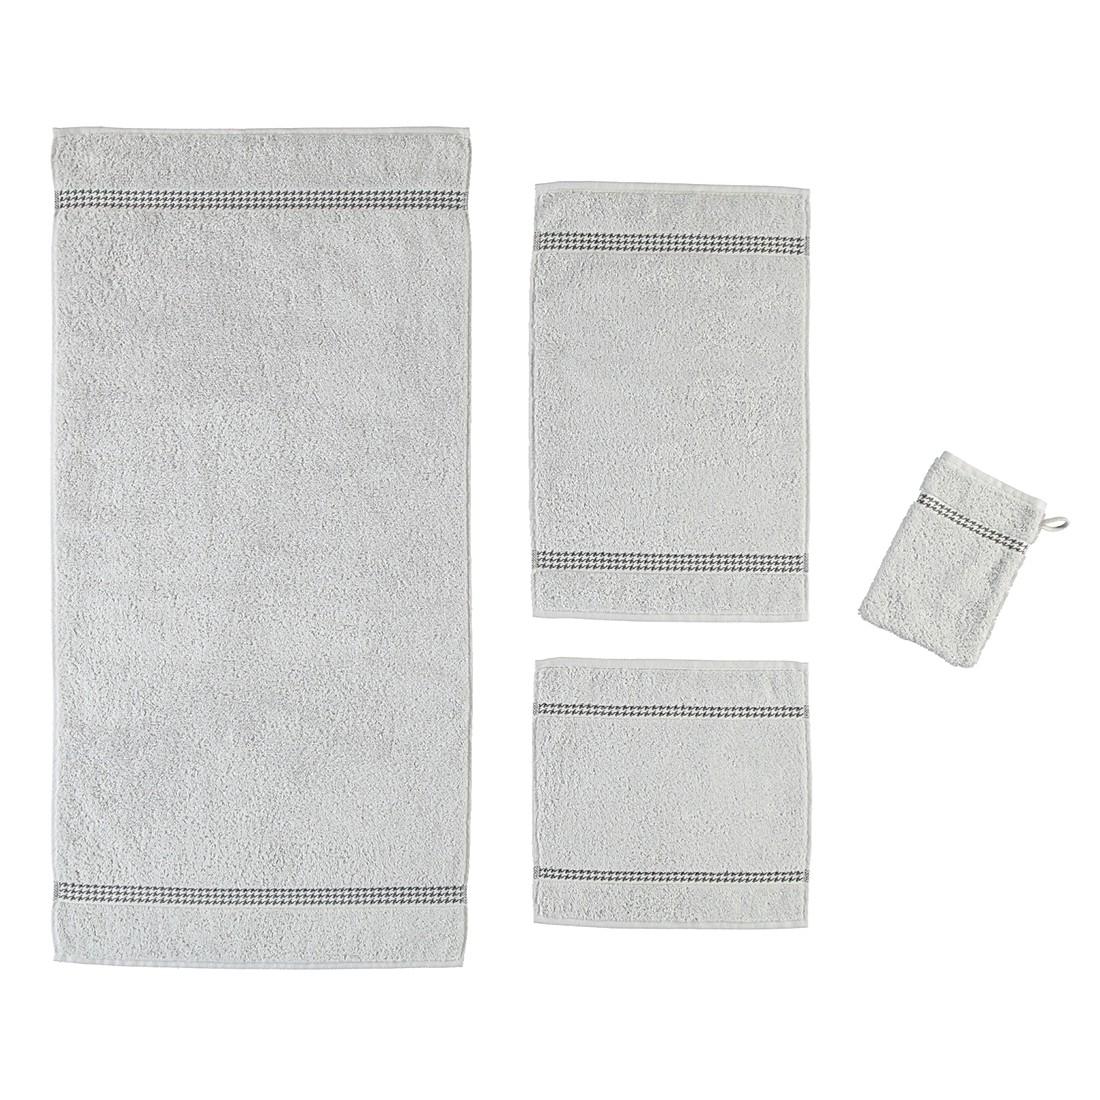 handt cher noblesse2 baumwolle zitrus handtuch. Black Bedroom Furniture Sets. Home Design Ideas